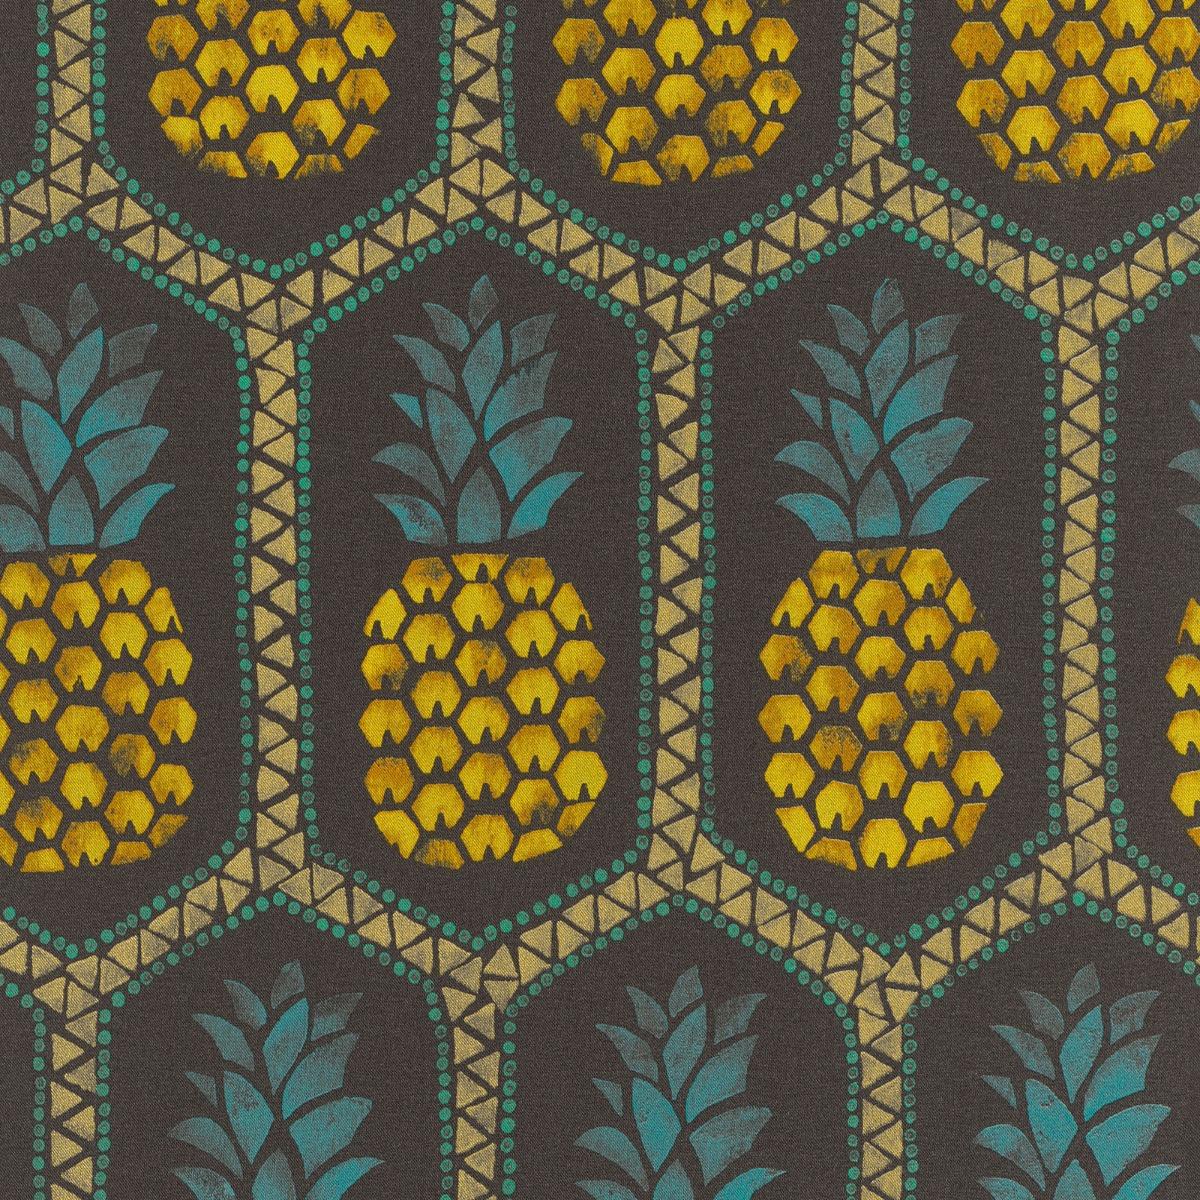 Barbara Becker Pineapple Wallpaper - Black and Yellow - Rasch 862140